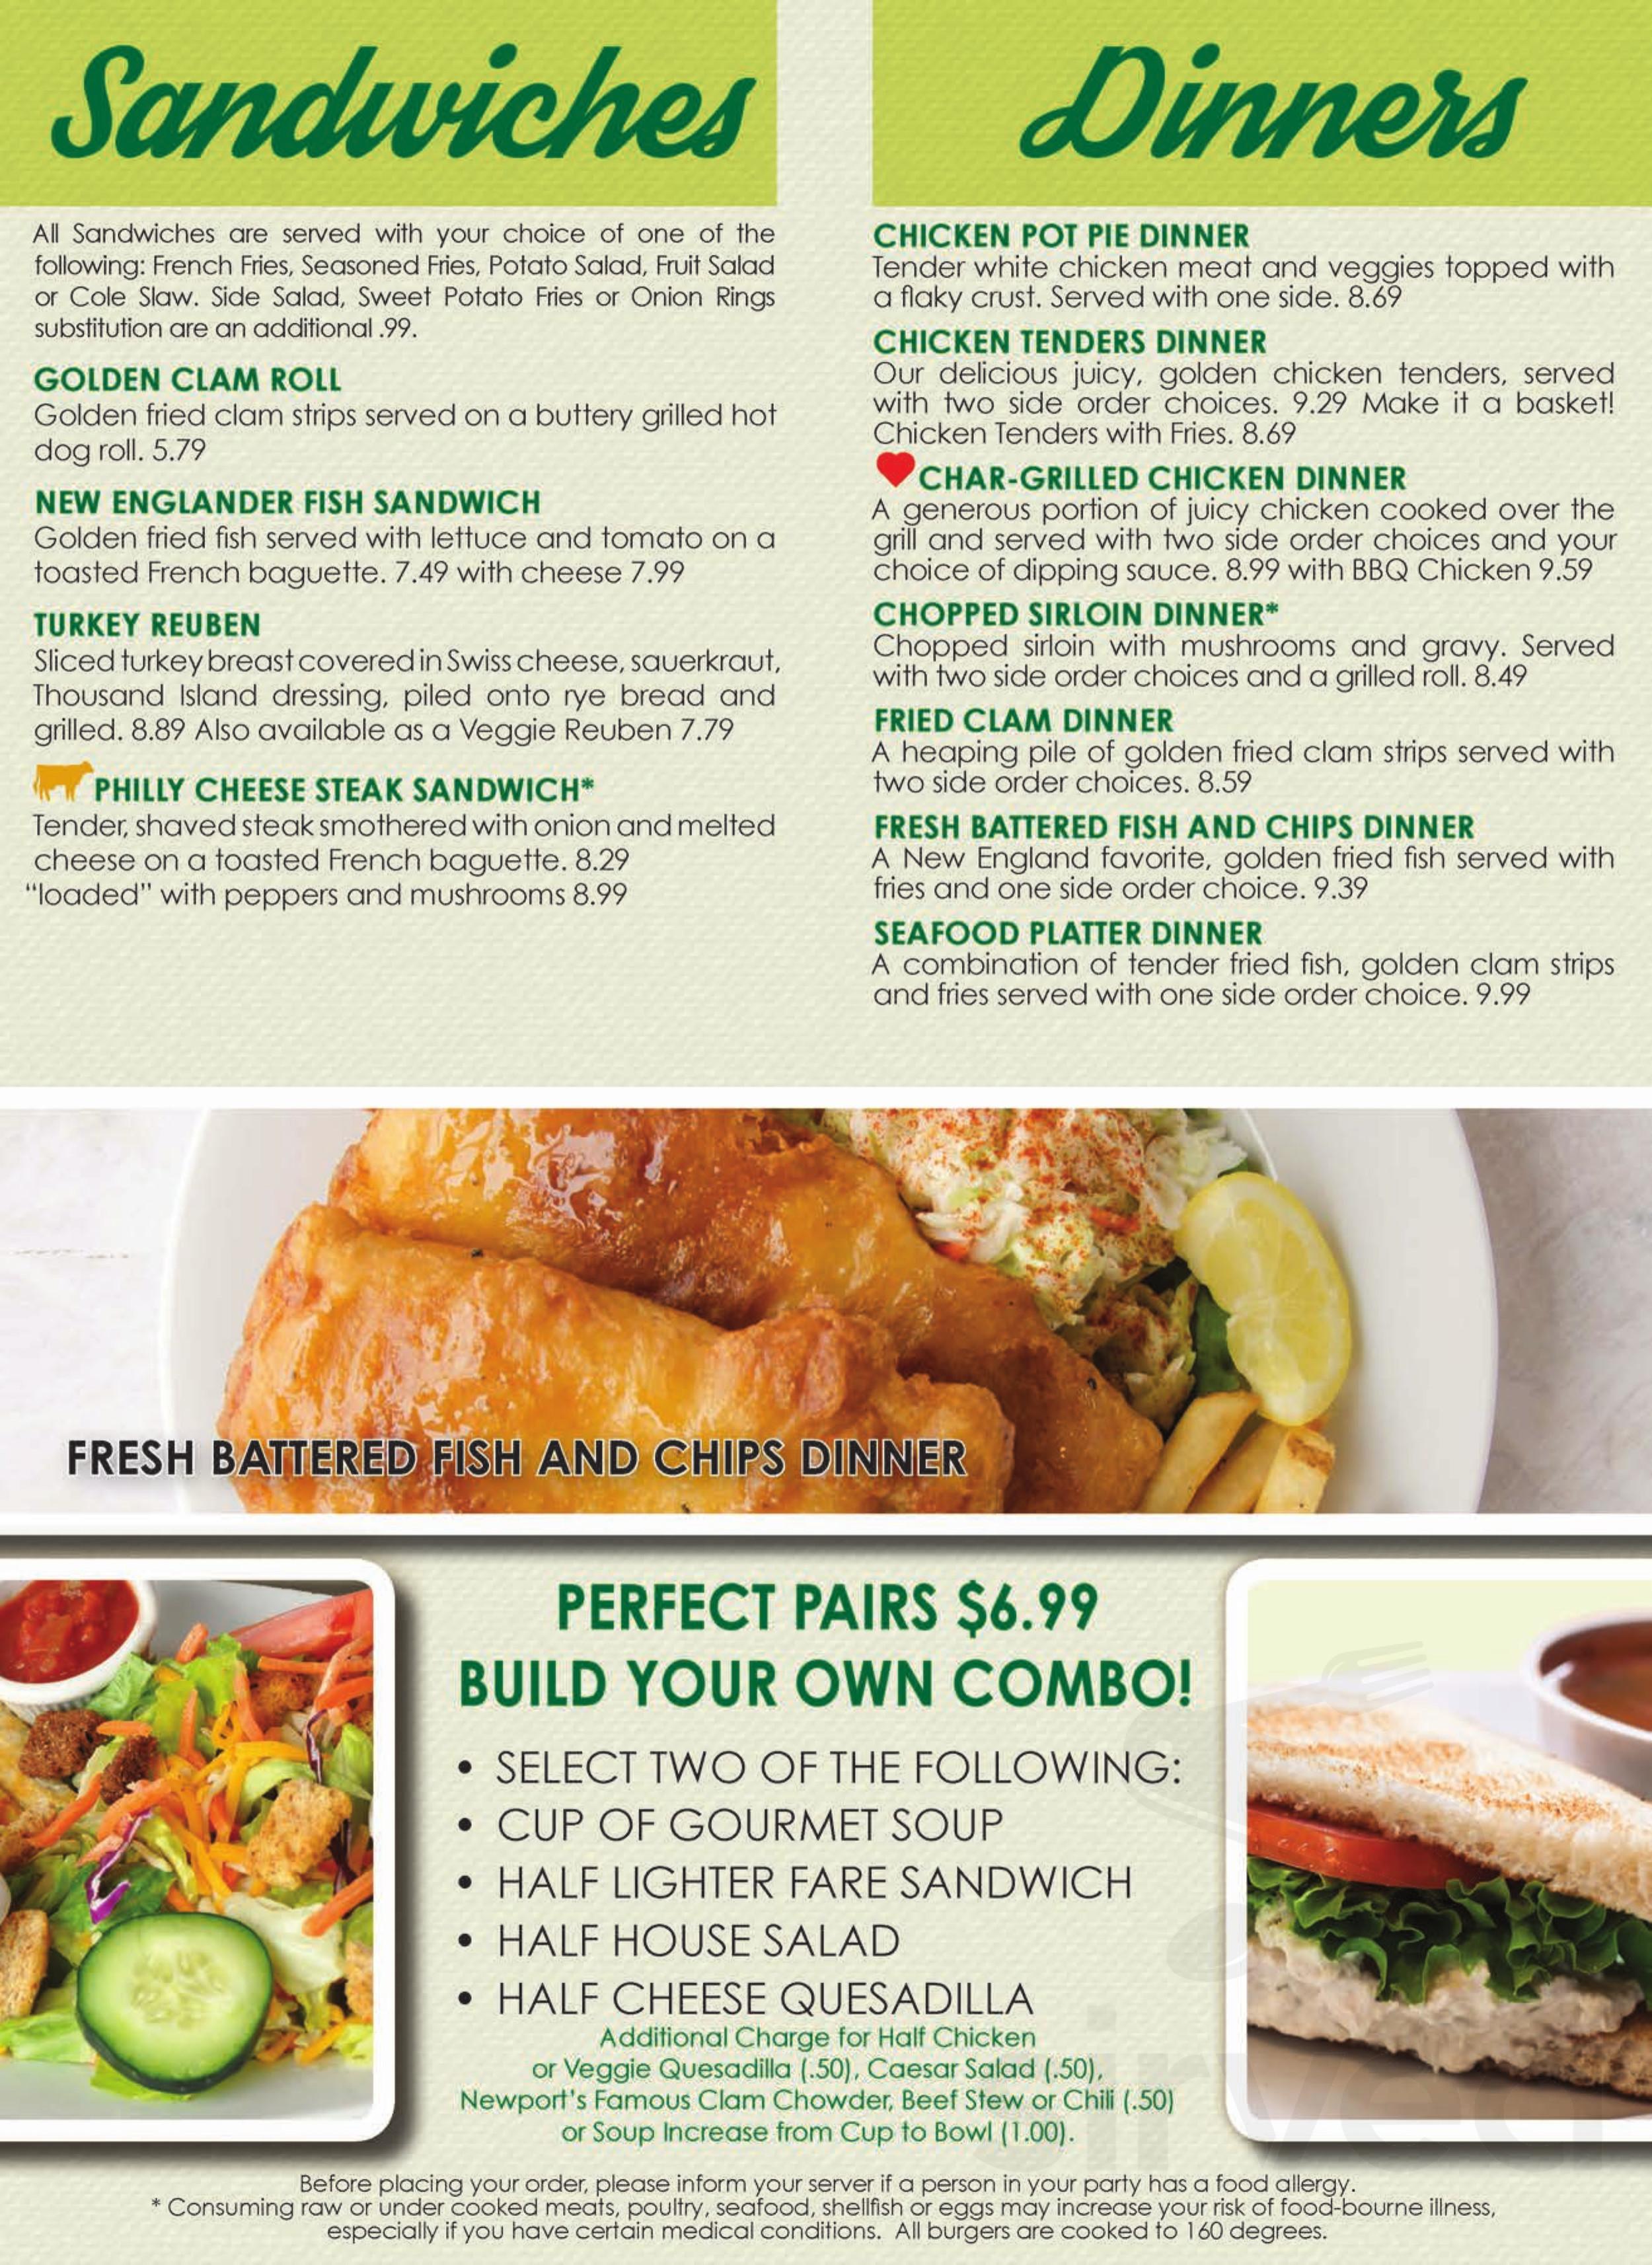 Newport Creamery menu in Fall River, Massachusetts, USA